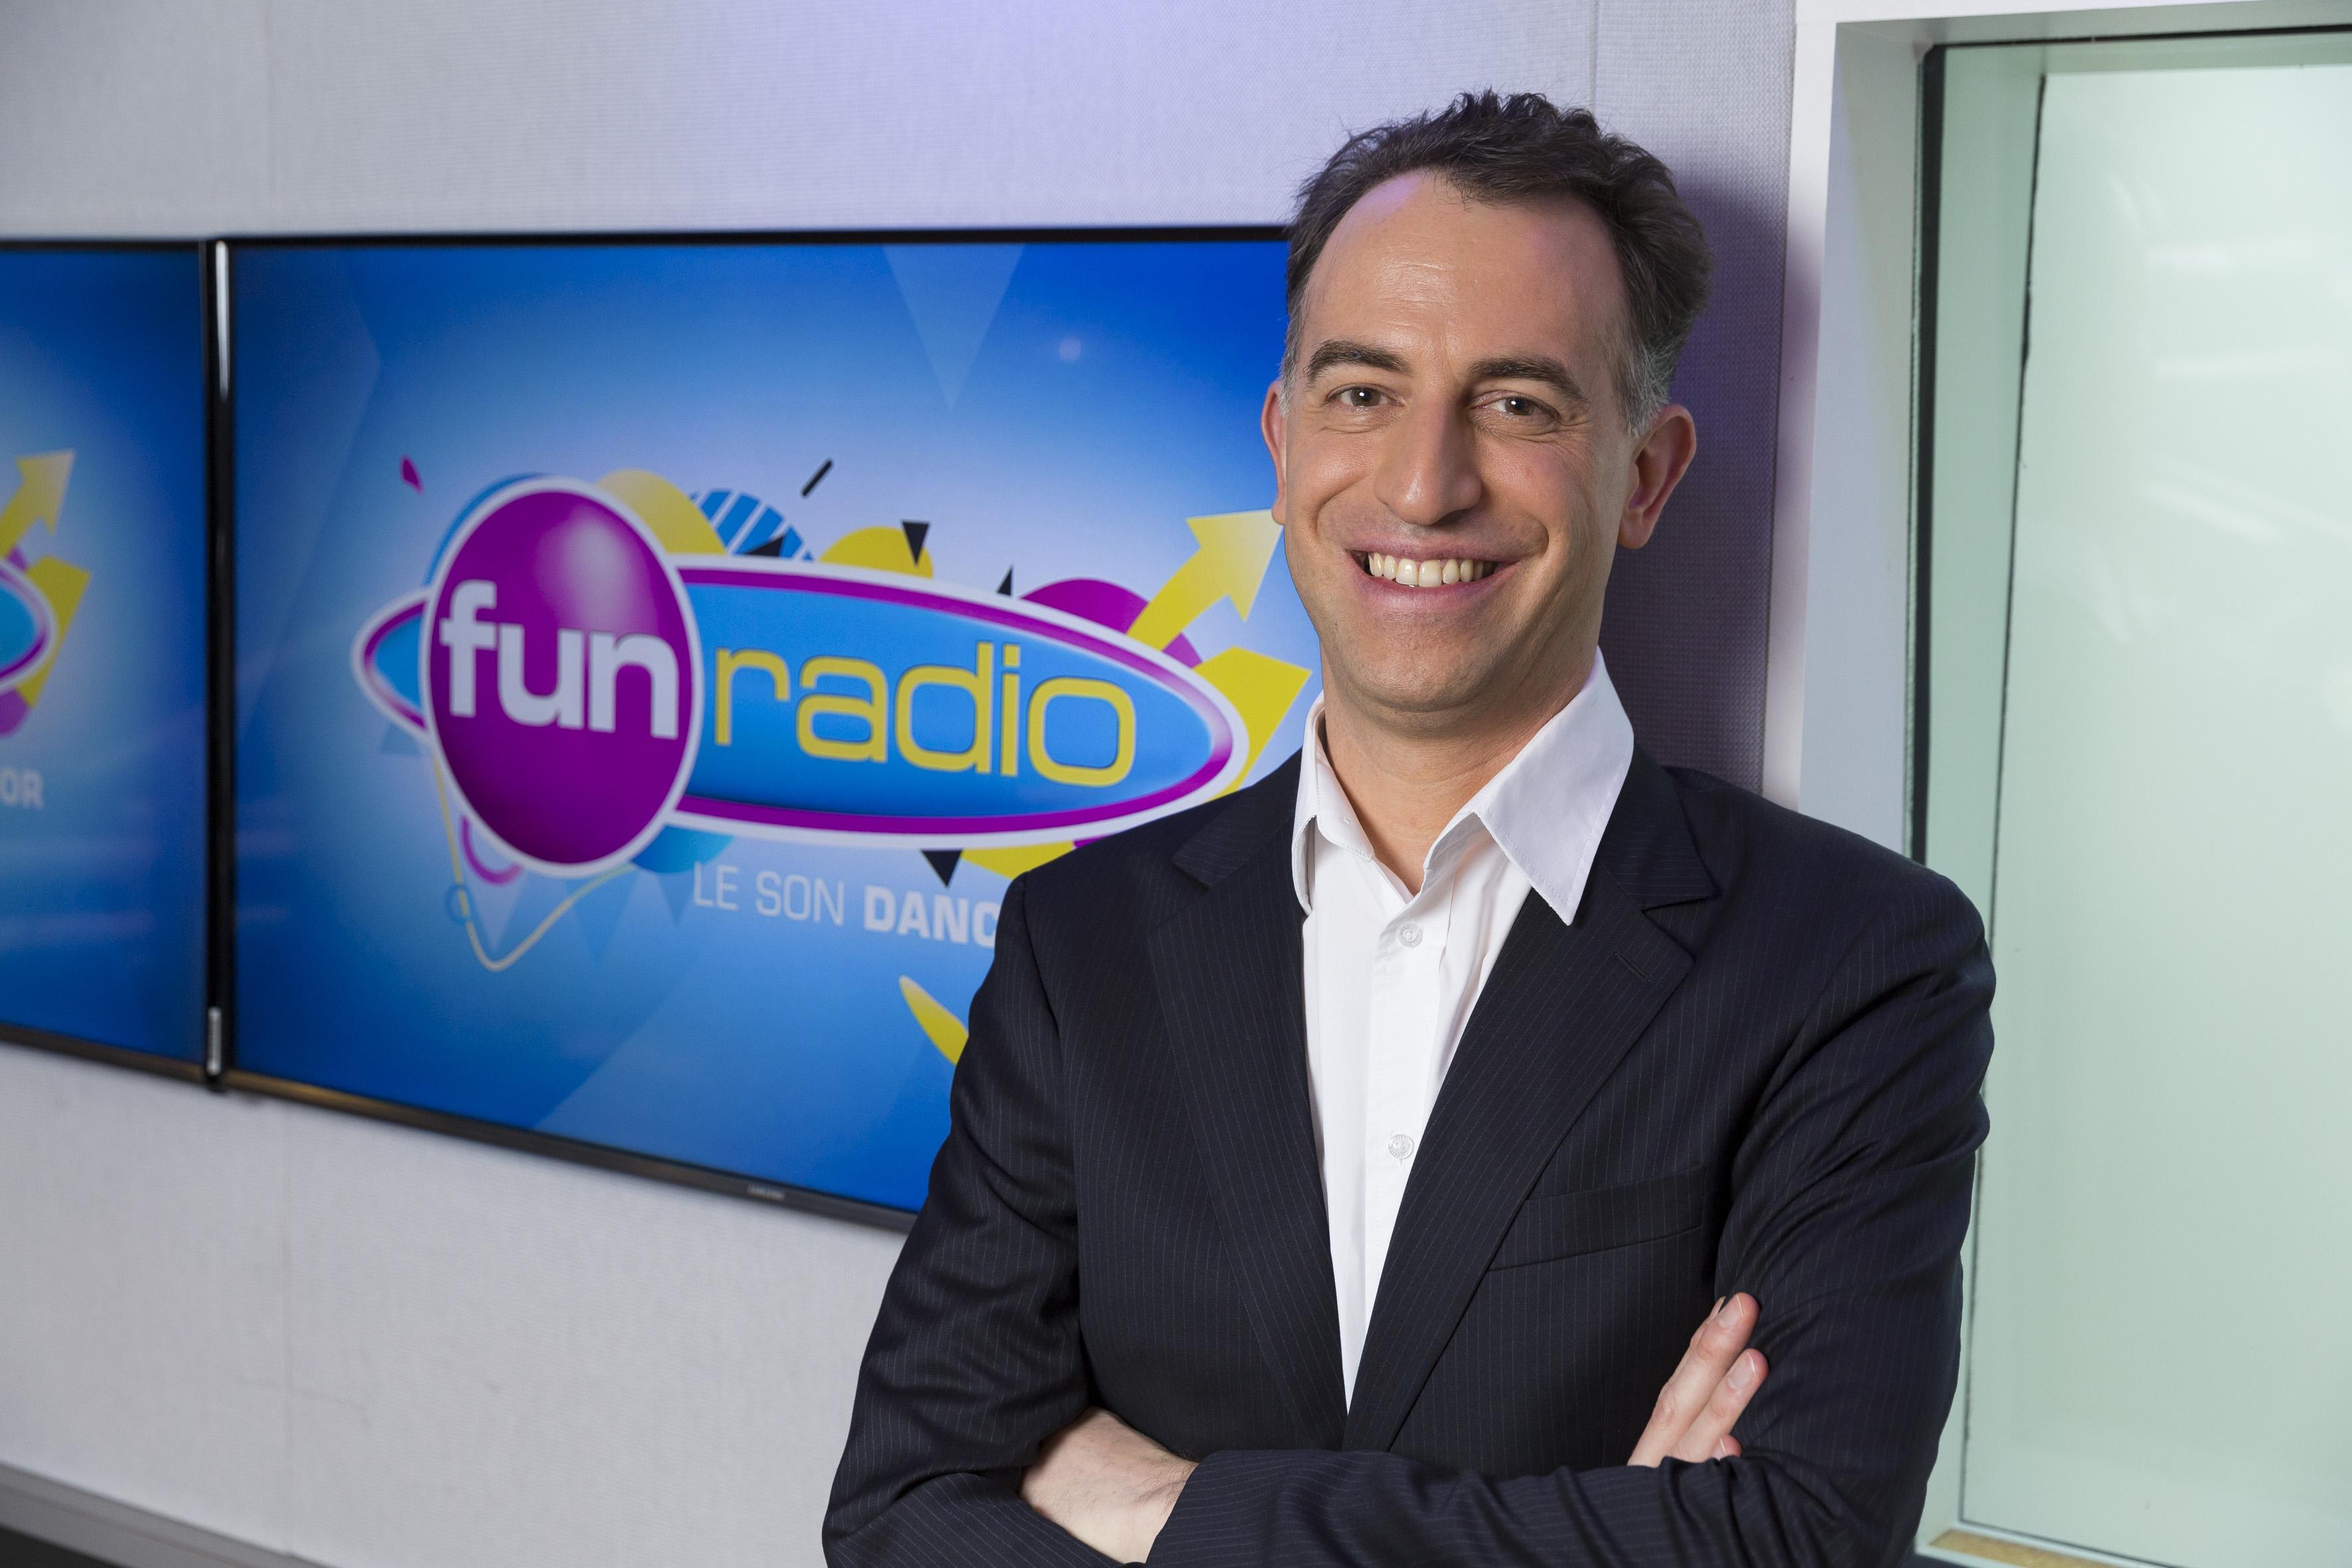 Tristan Jurgensen dirige Fun Radio, une musicale de RTL Group © Sipa